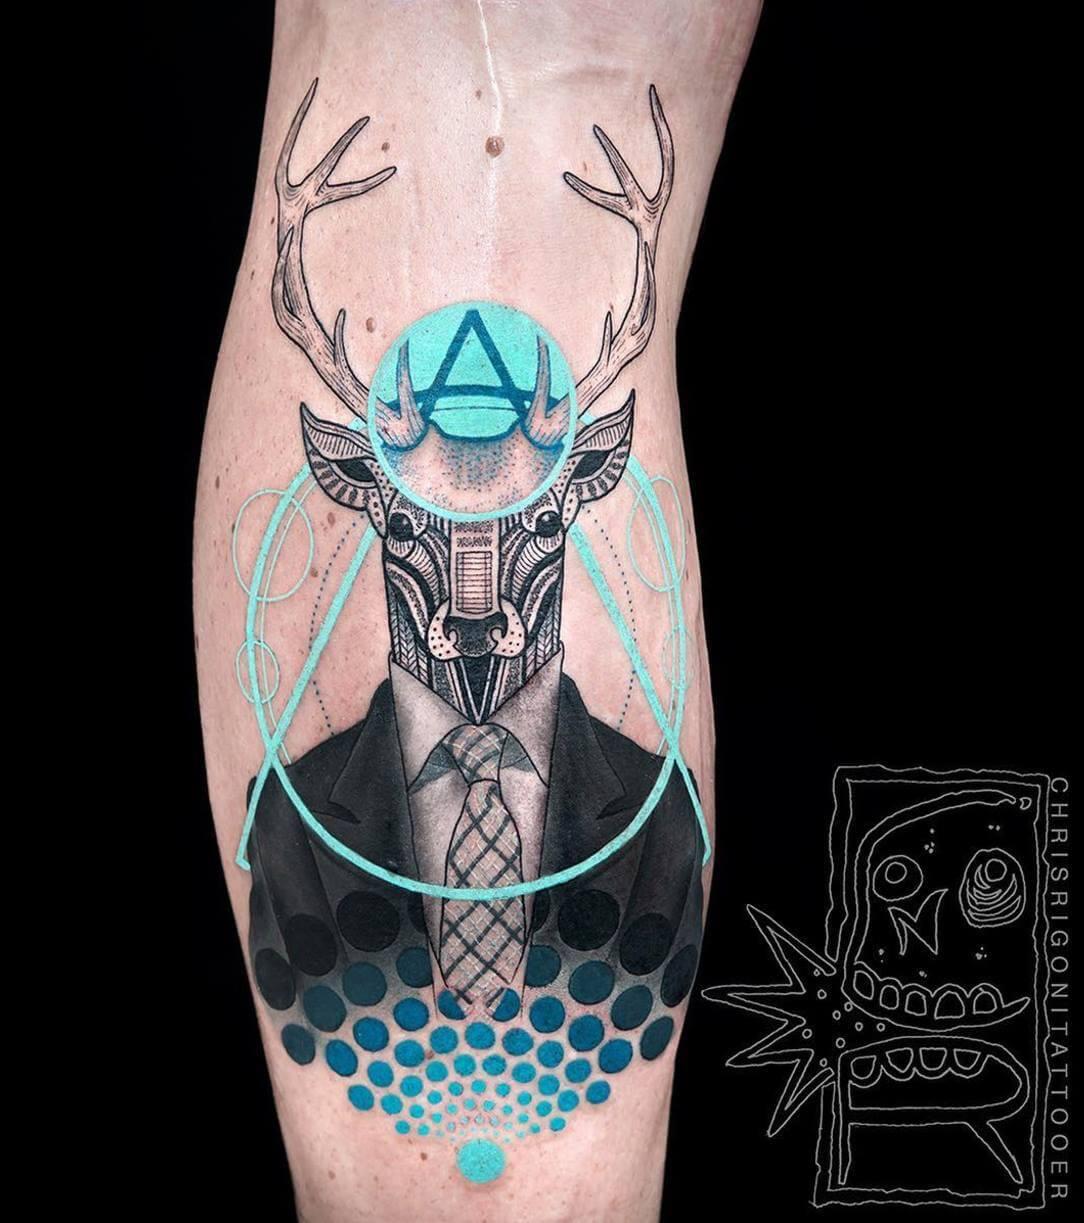 chris rigoni amazing tattoos 3 (1)